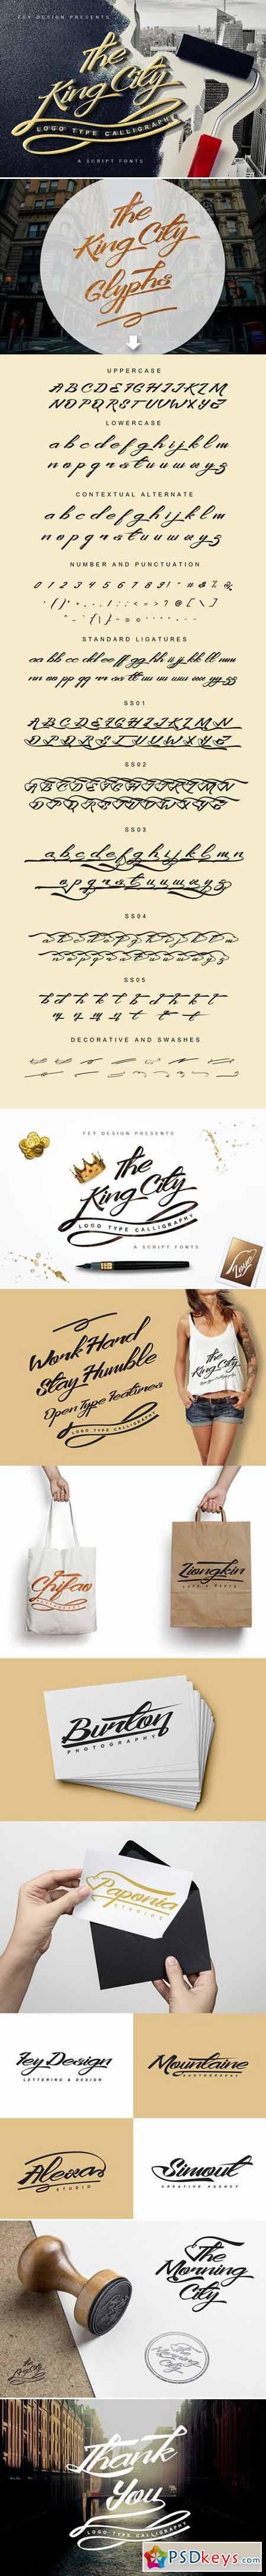 King City - Logo Type Calligraphy 419478